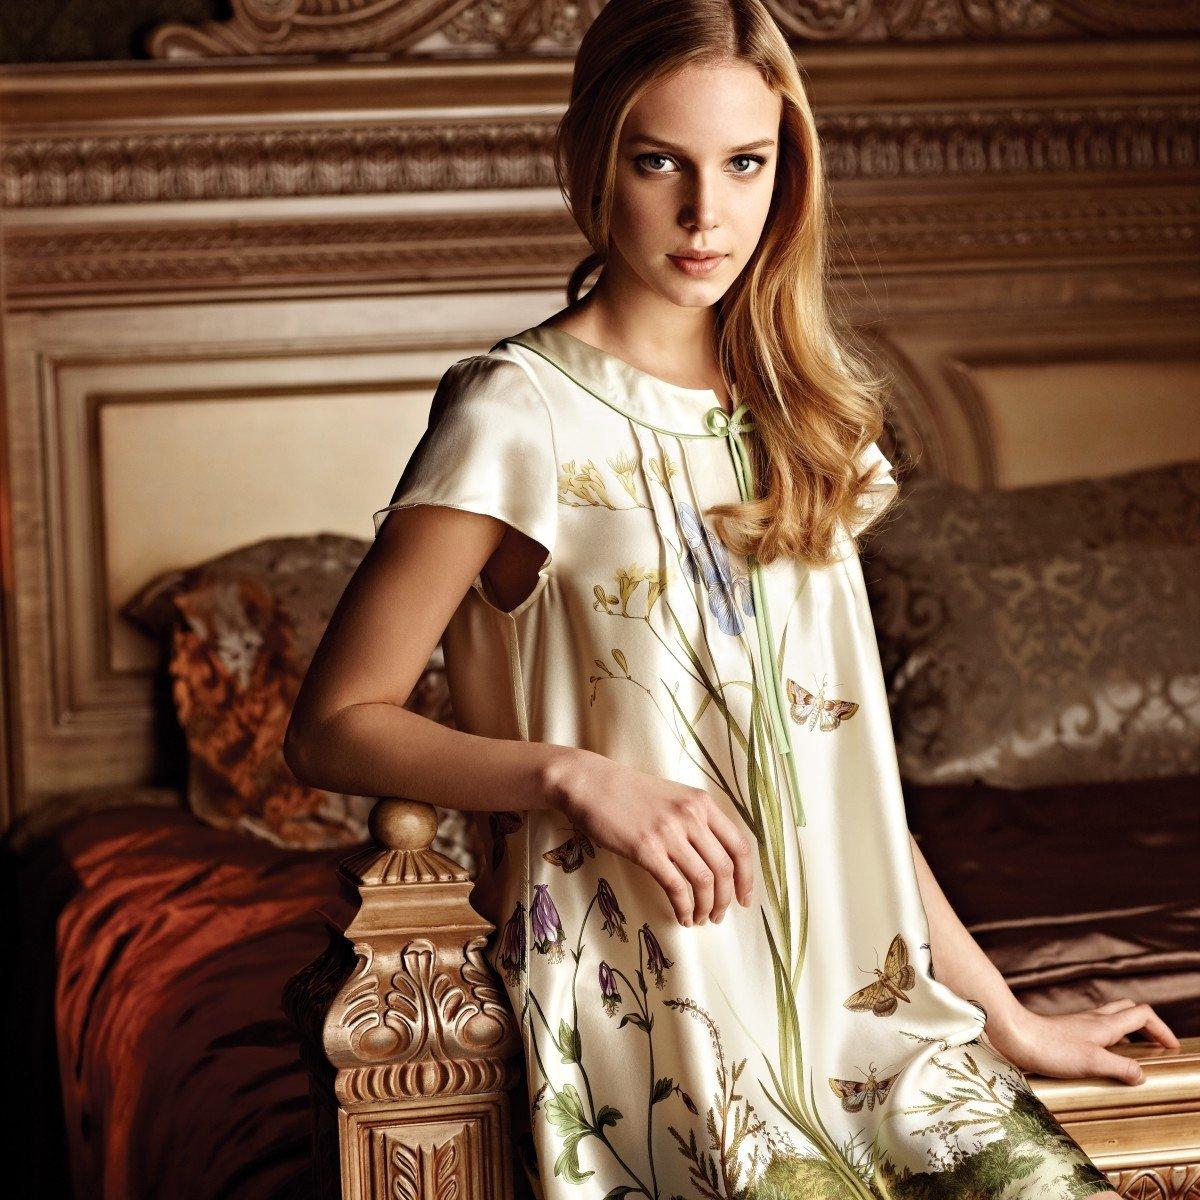 Rustic Fresh Flower Princess Classic Vintage Women 100% Silk Pajamas